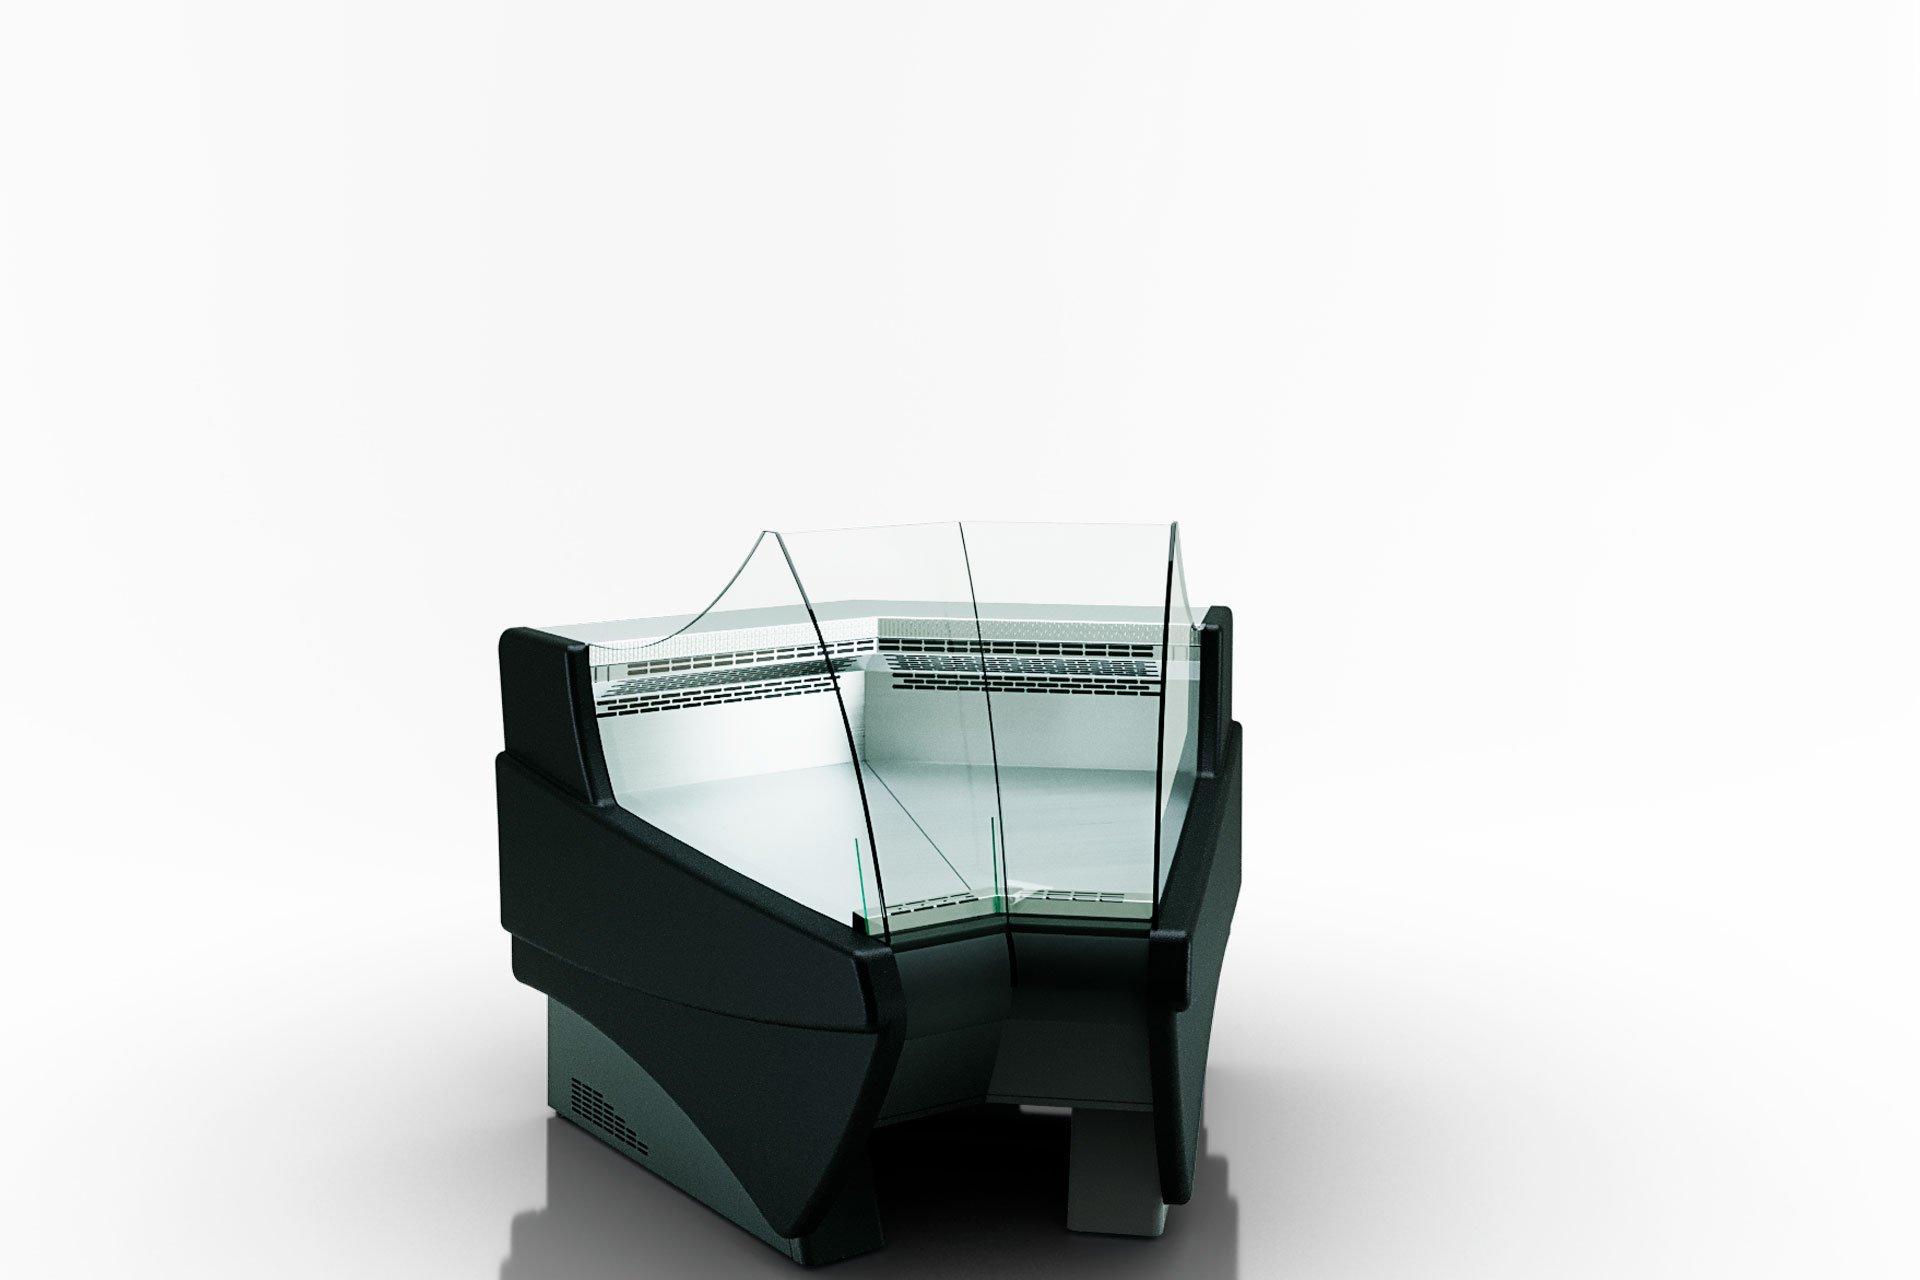 Вітрина Symphony luxe MG 120 deli T2 110-DLM-IS45